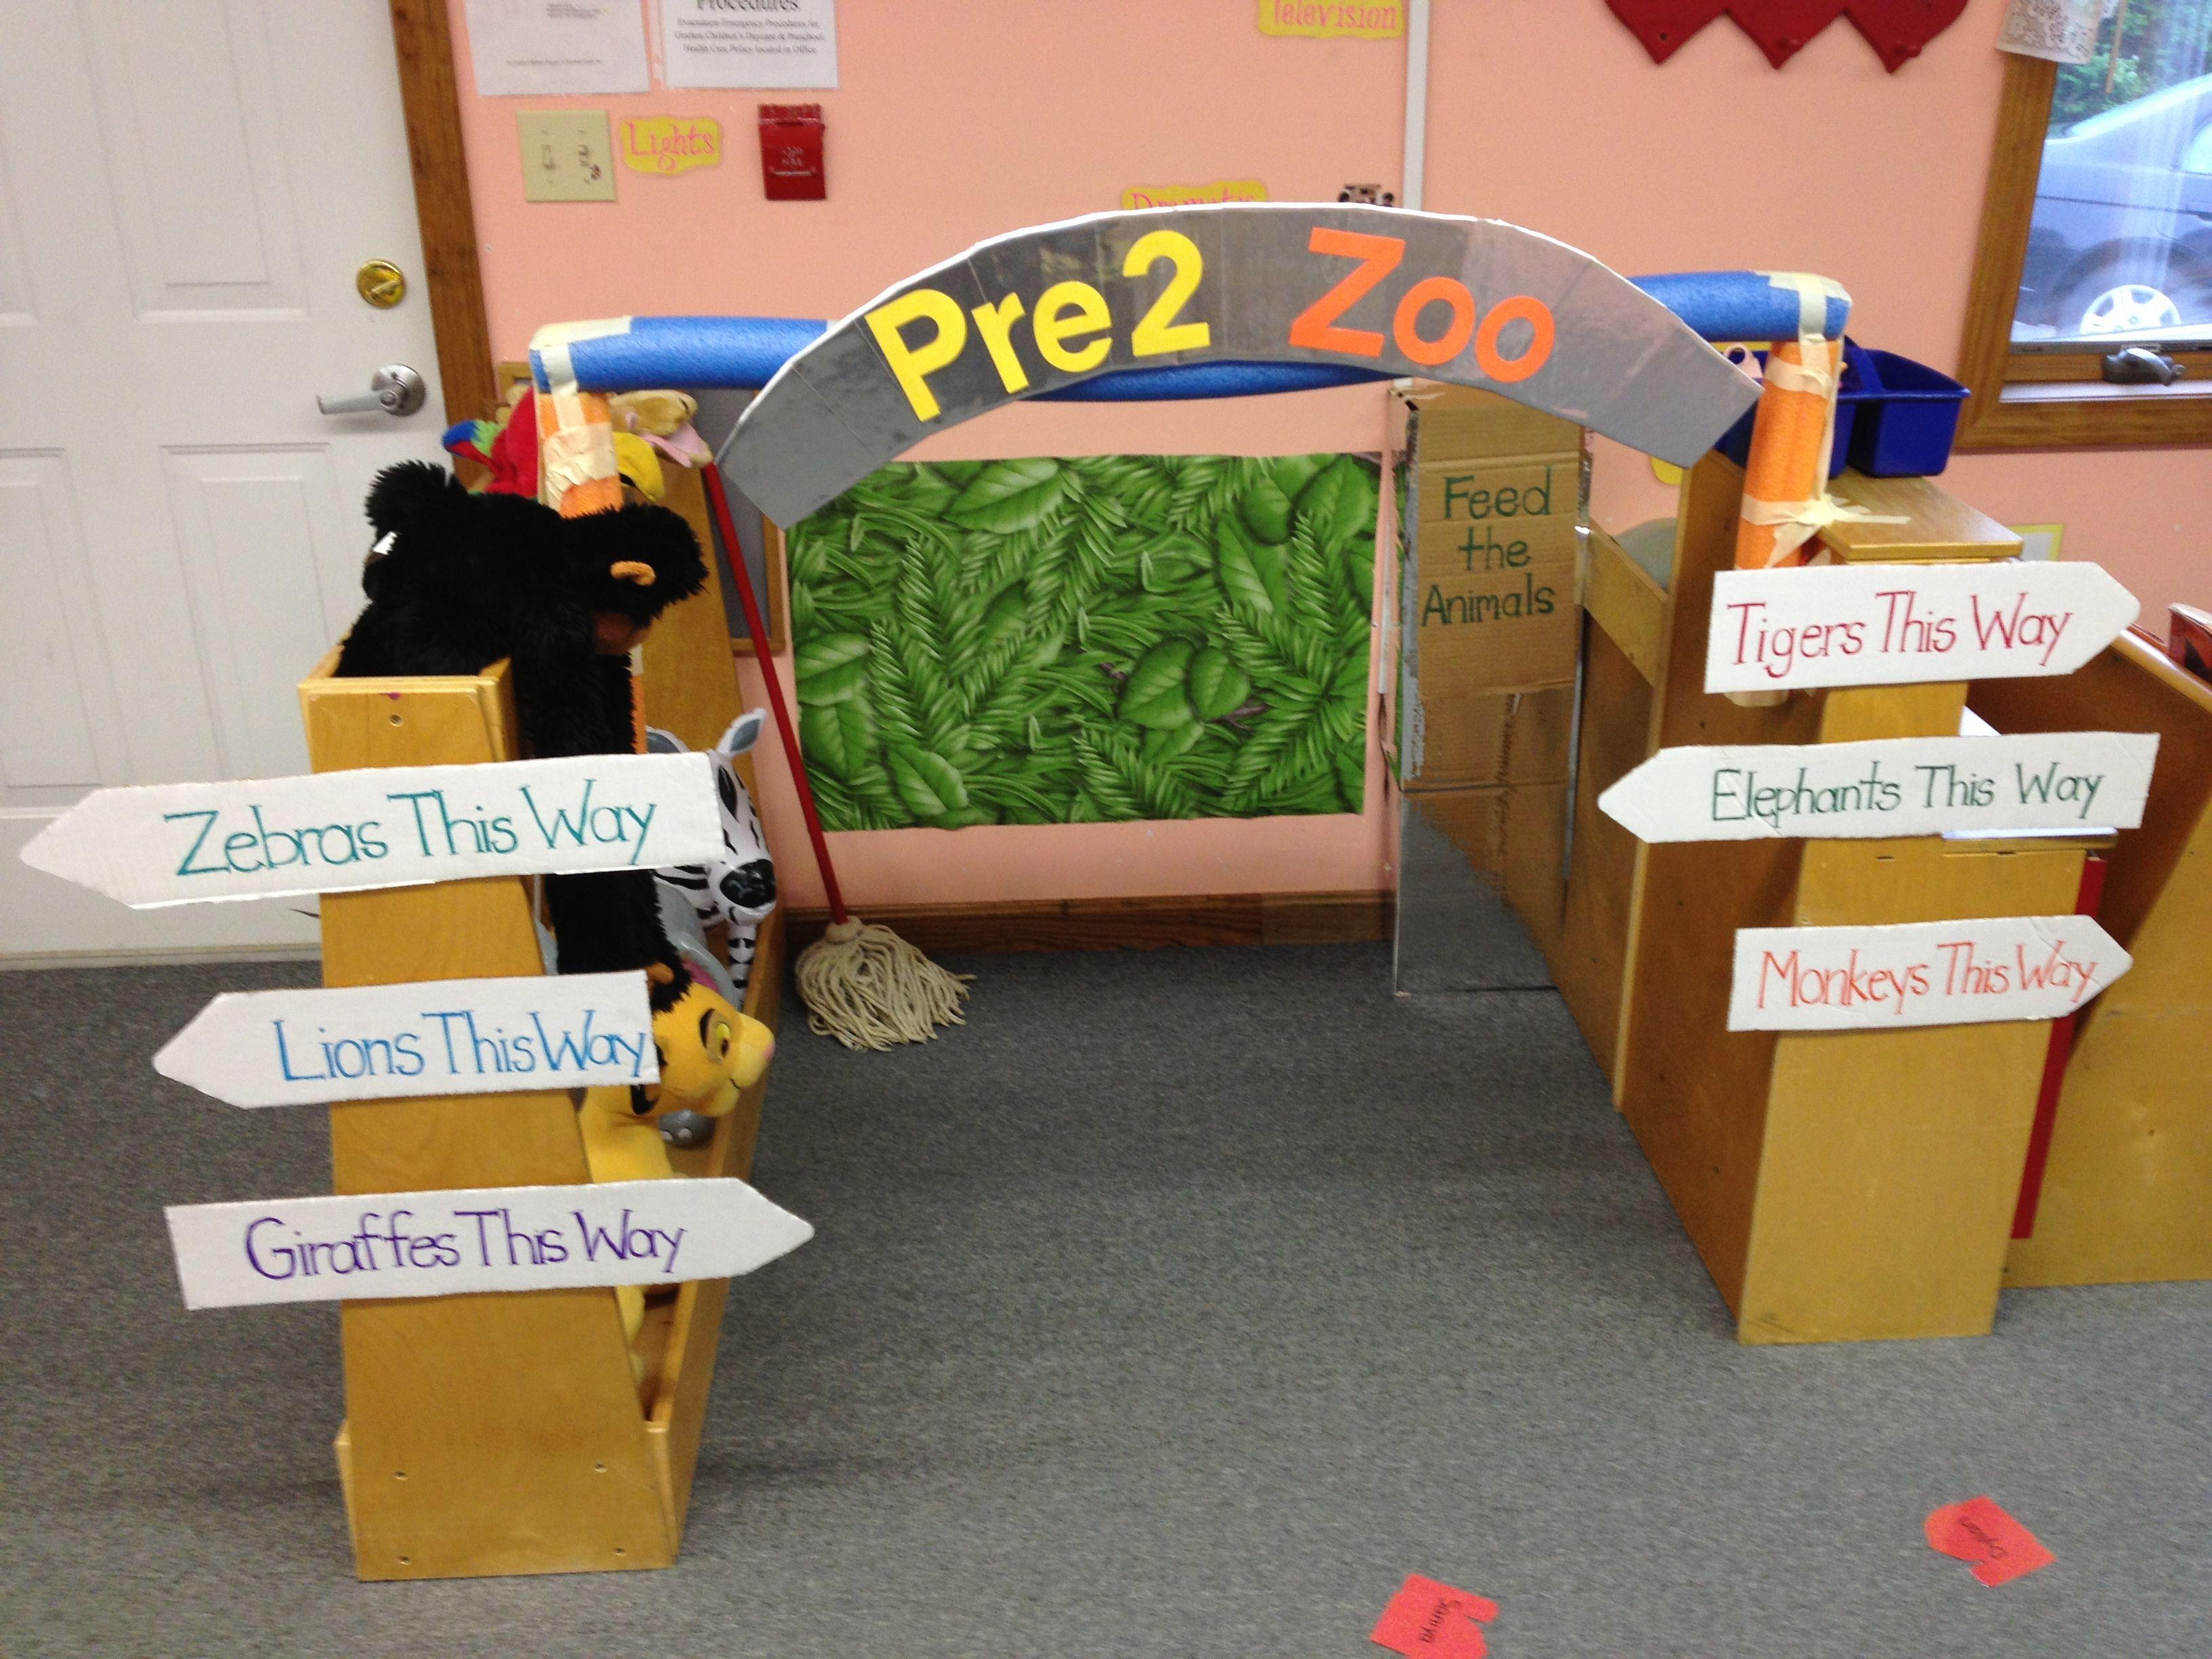 Zoo animal scrapbook ideas - Dramatic Play Ideas